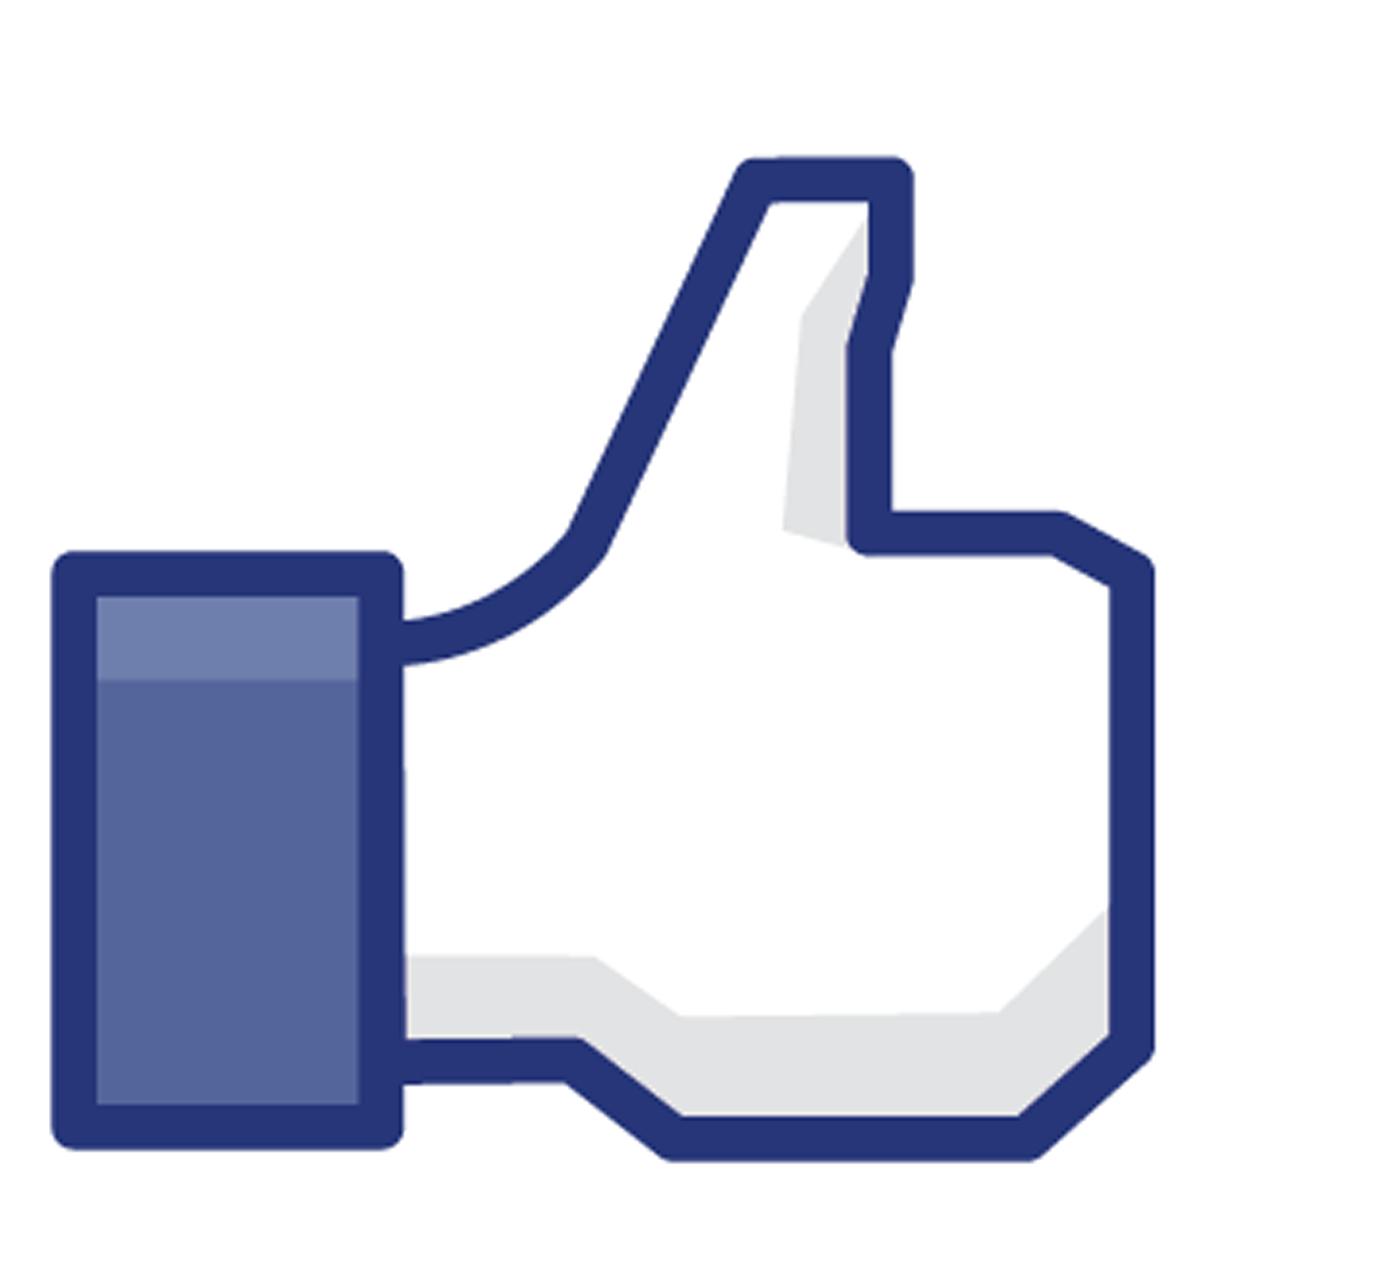 any tricks for facebook, twitter, traffic